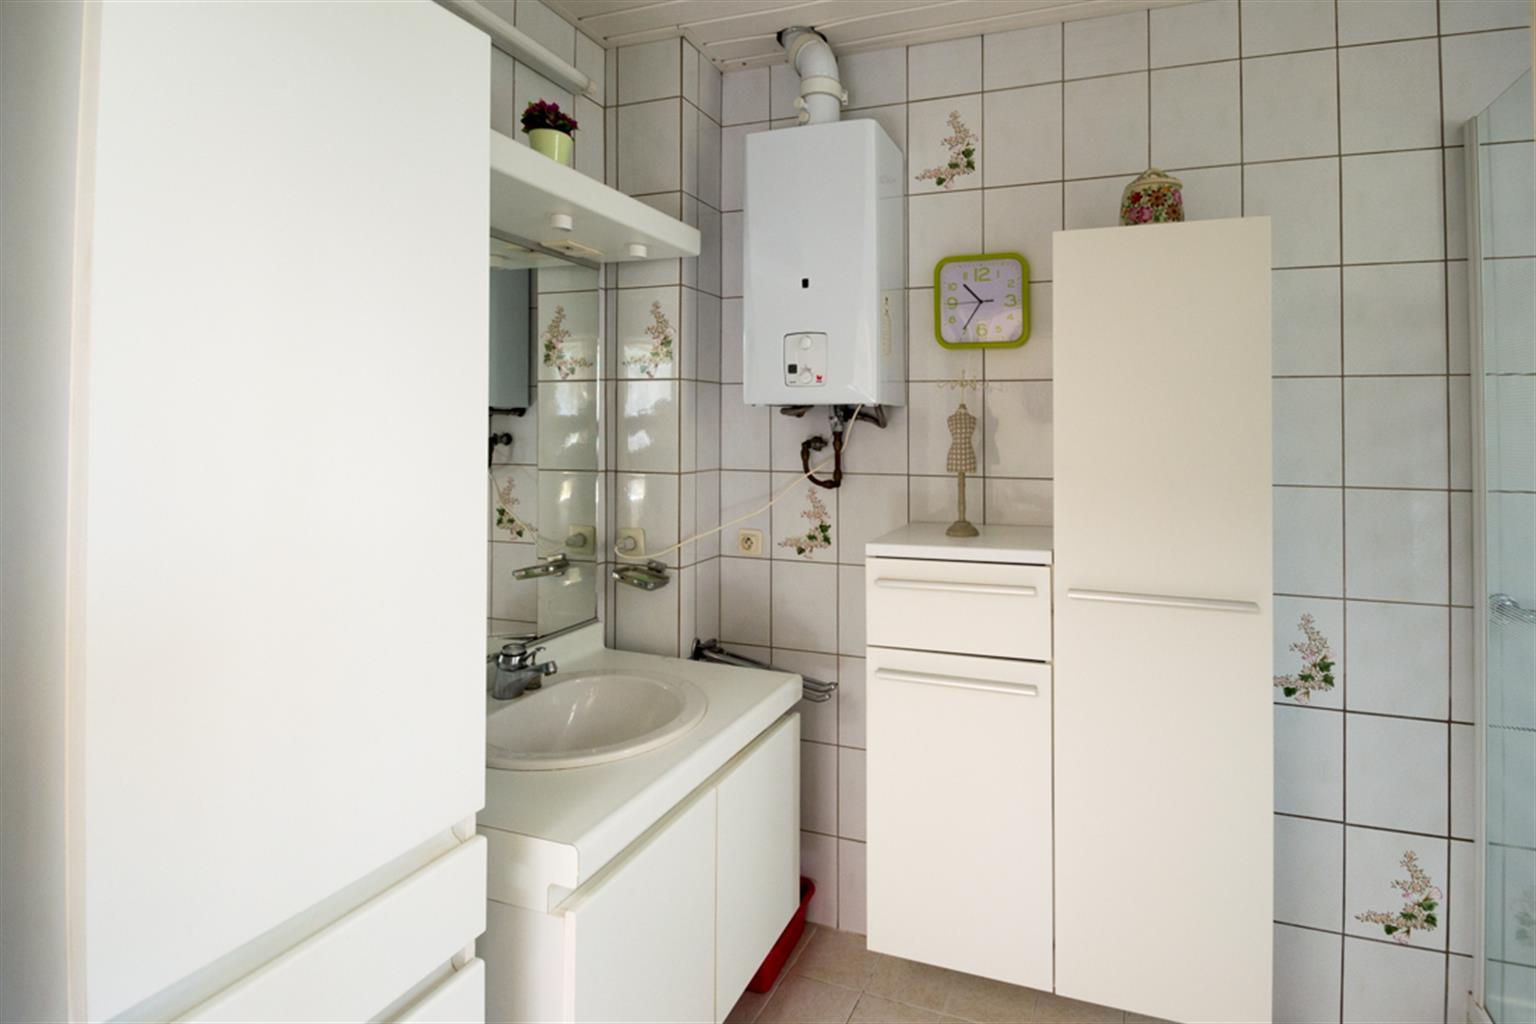 Maison - Leval-Trahegnies - #4345091-10